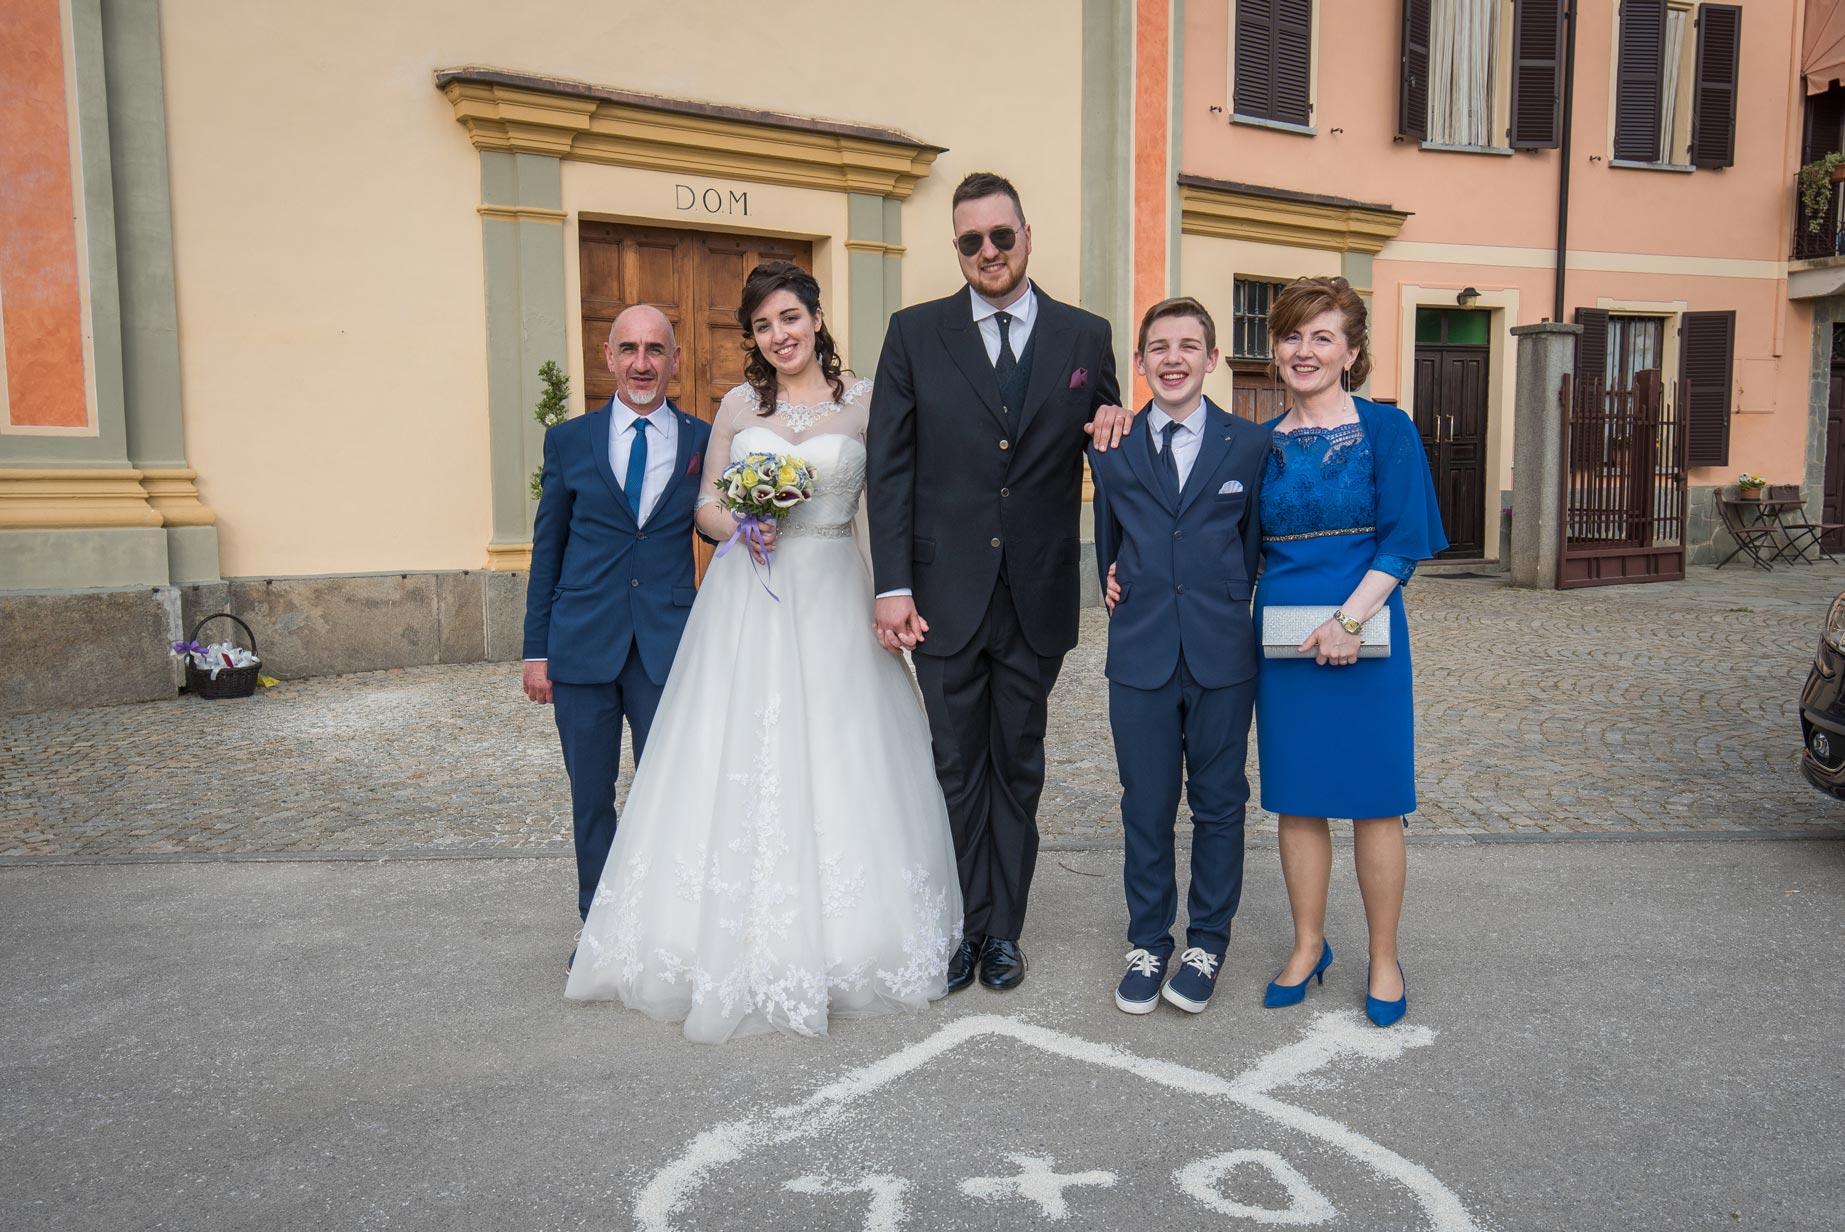 Matrimonio a Narzole Lorenza Diego - DSC 0645 - Fotografie matrimonio con parenti - Fotografie matrimonio con parenti